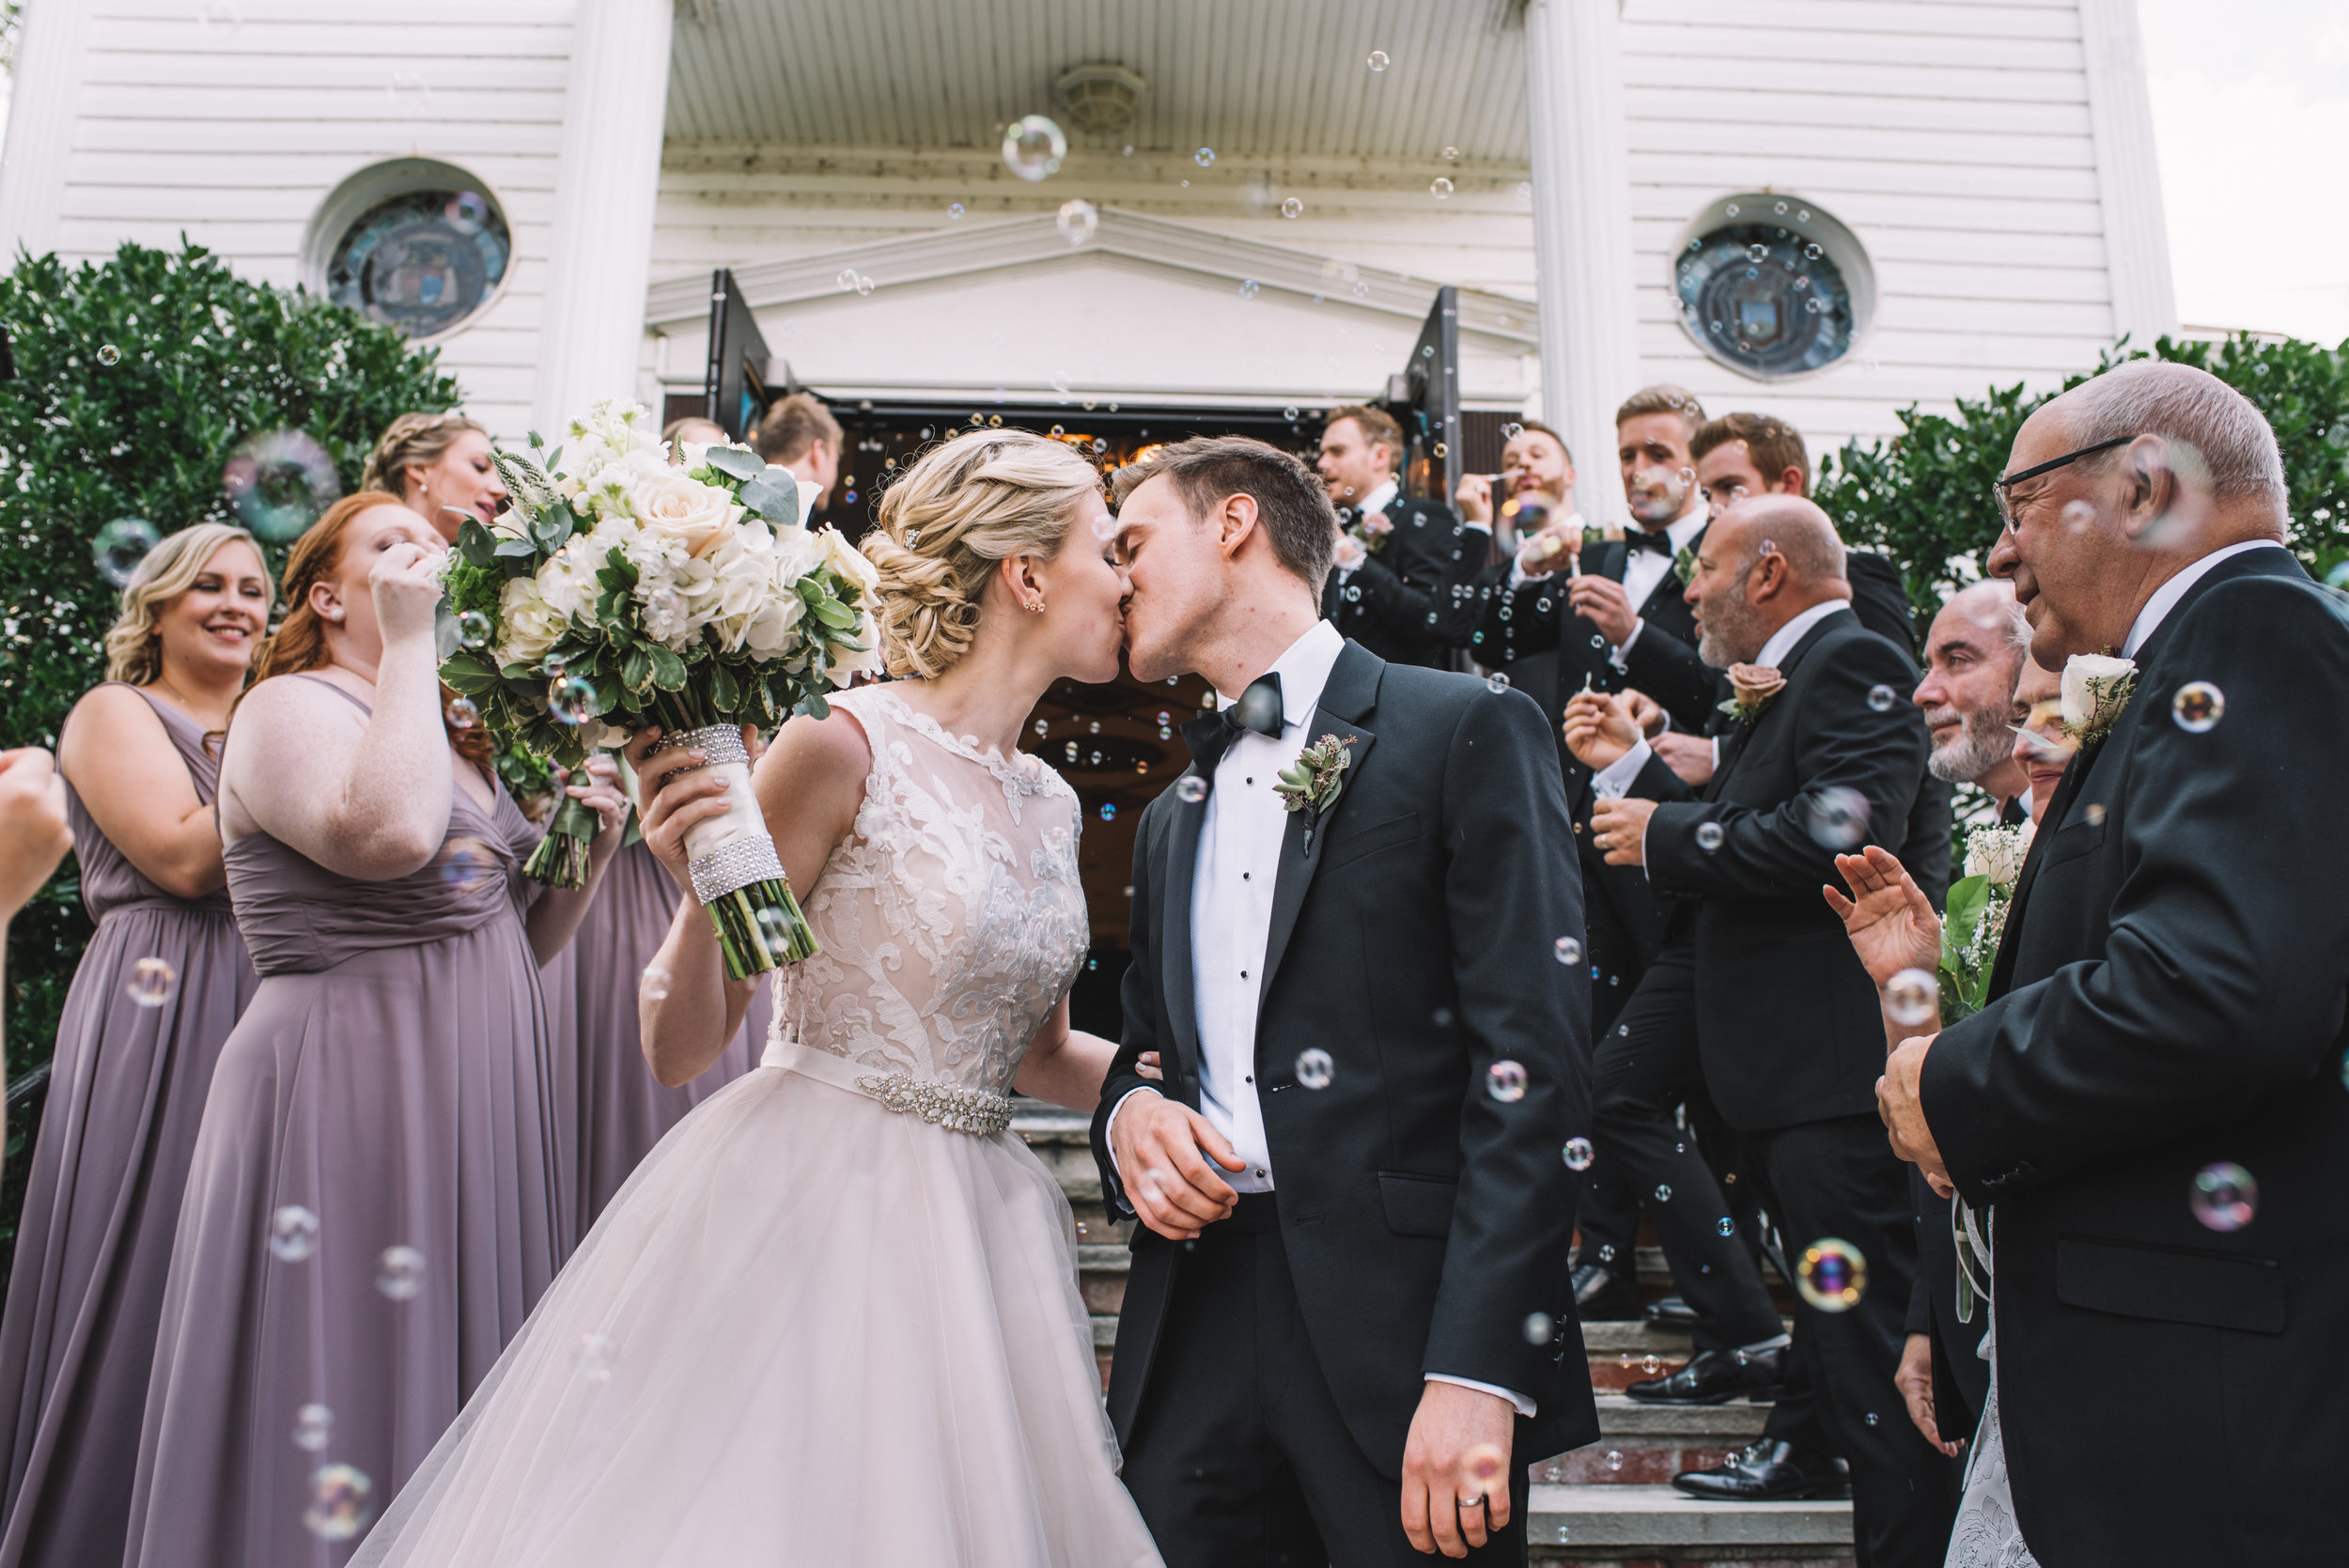 WeddingPhotos | NJPhotographer | Highlights-6-14.jpg